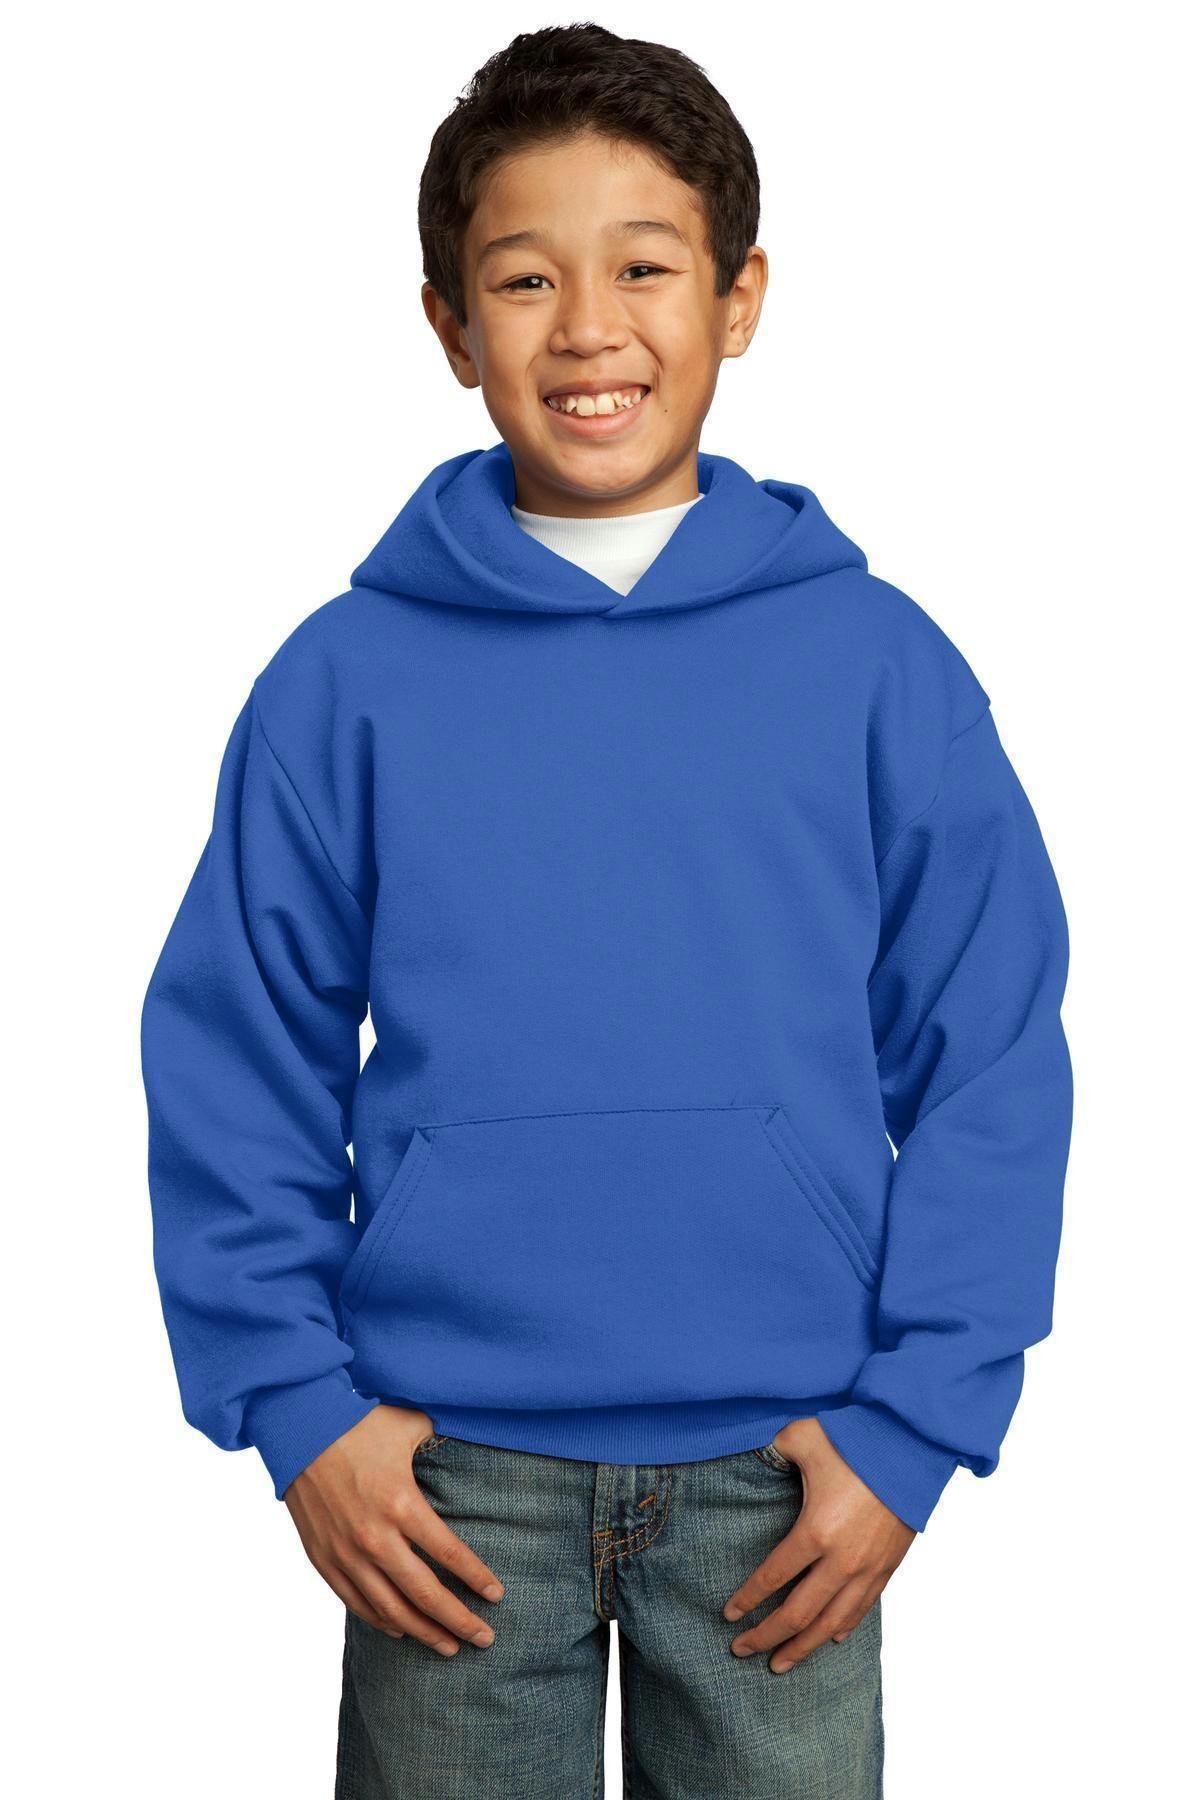 Tstars Funny Avocado /& Nachos Holy Guacamole Ugly Christmas Youth Kids Sweatshirt